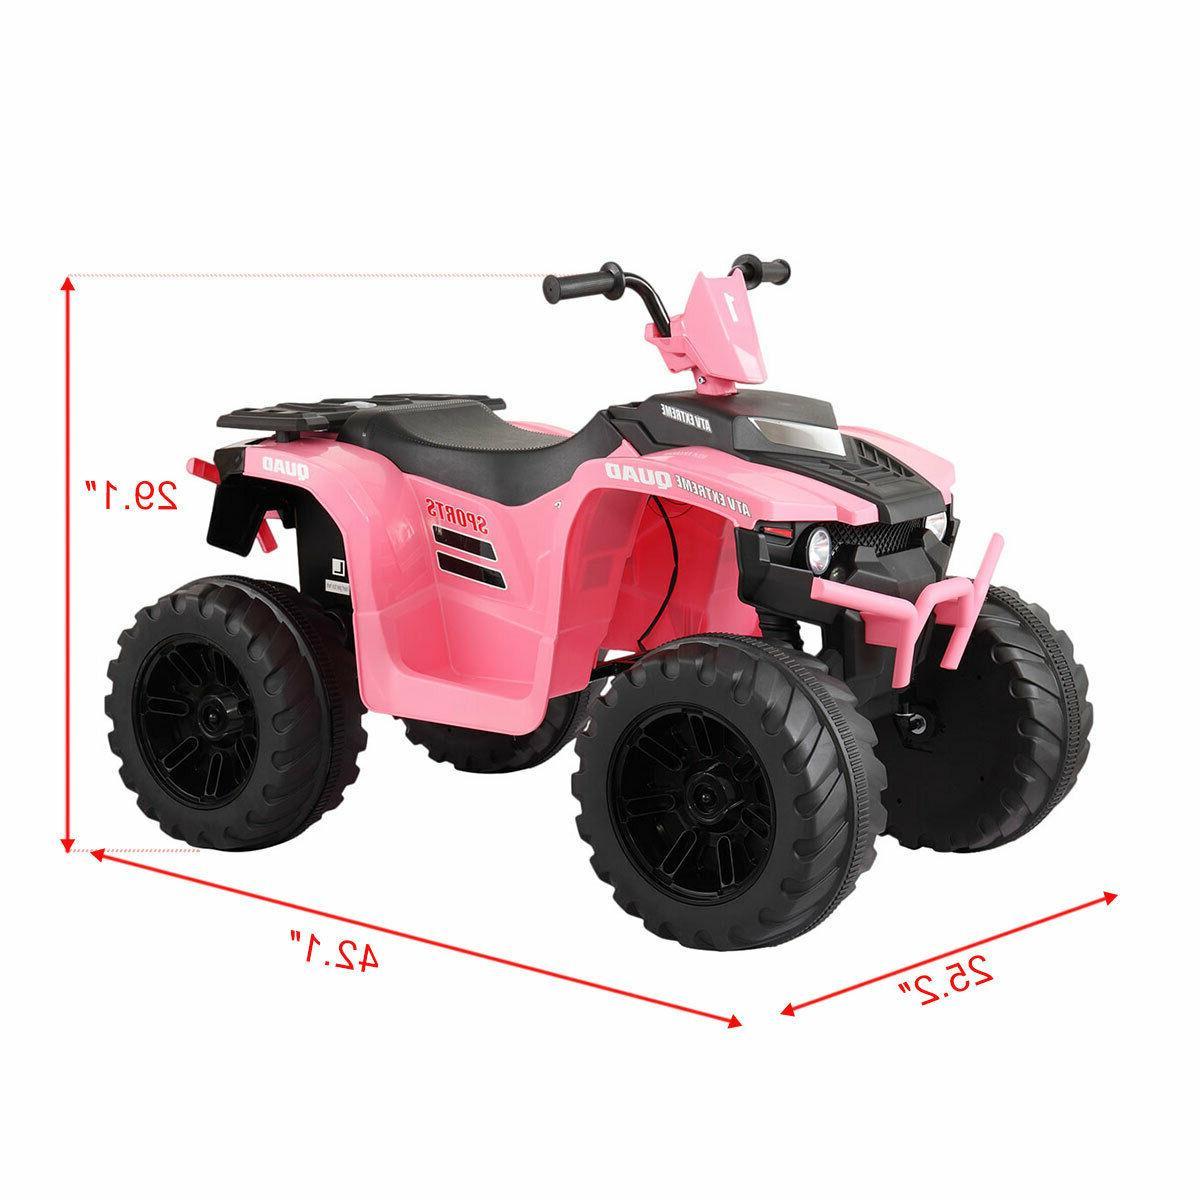 12V ATV Wheels Powered Ride On Toy W/ Music